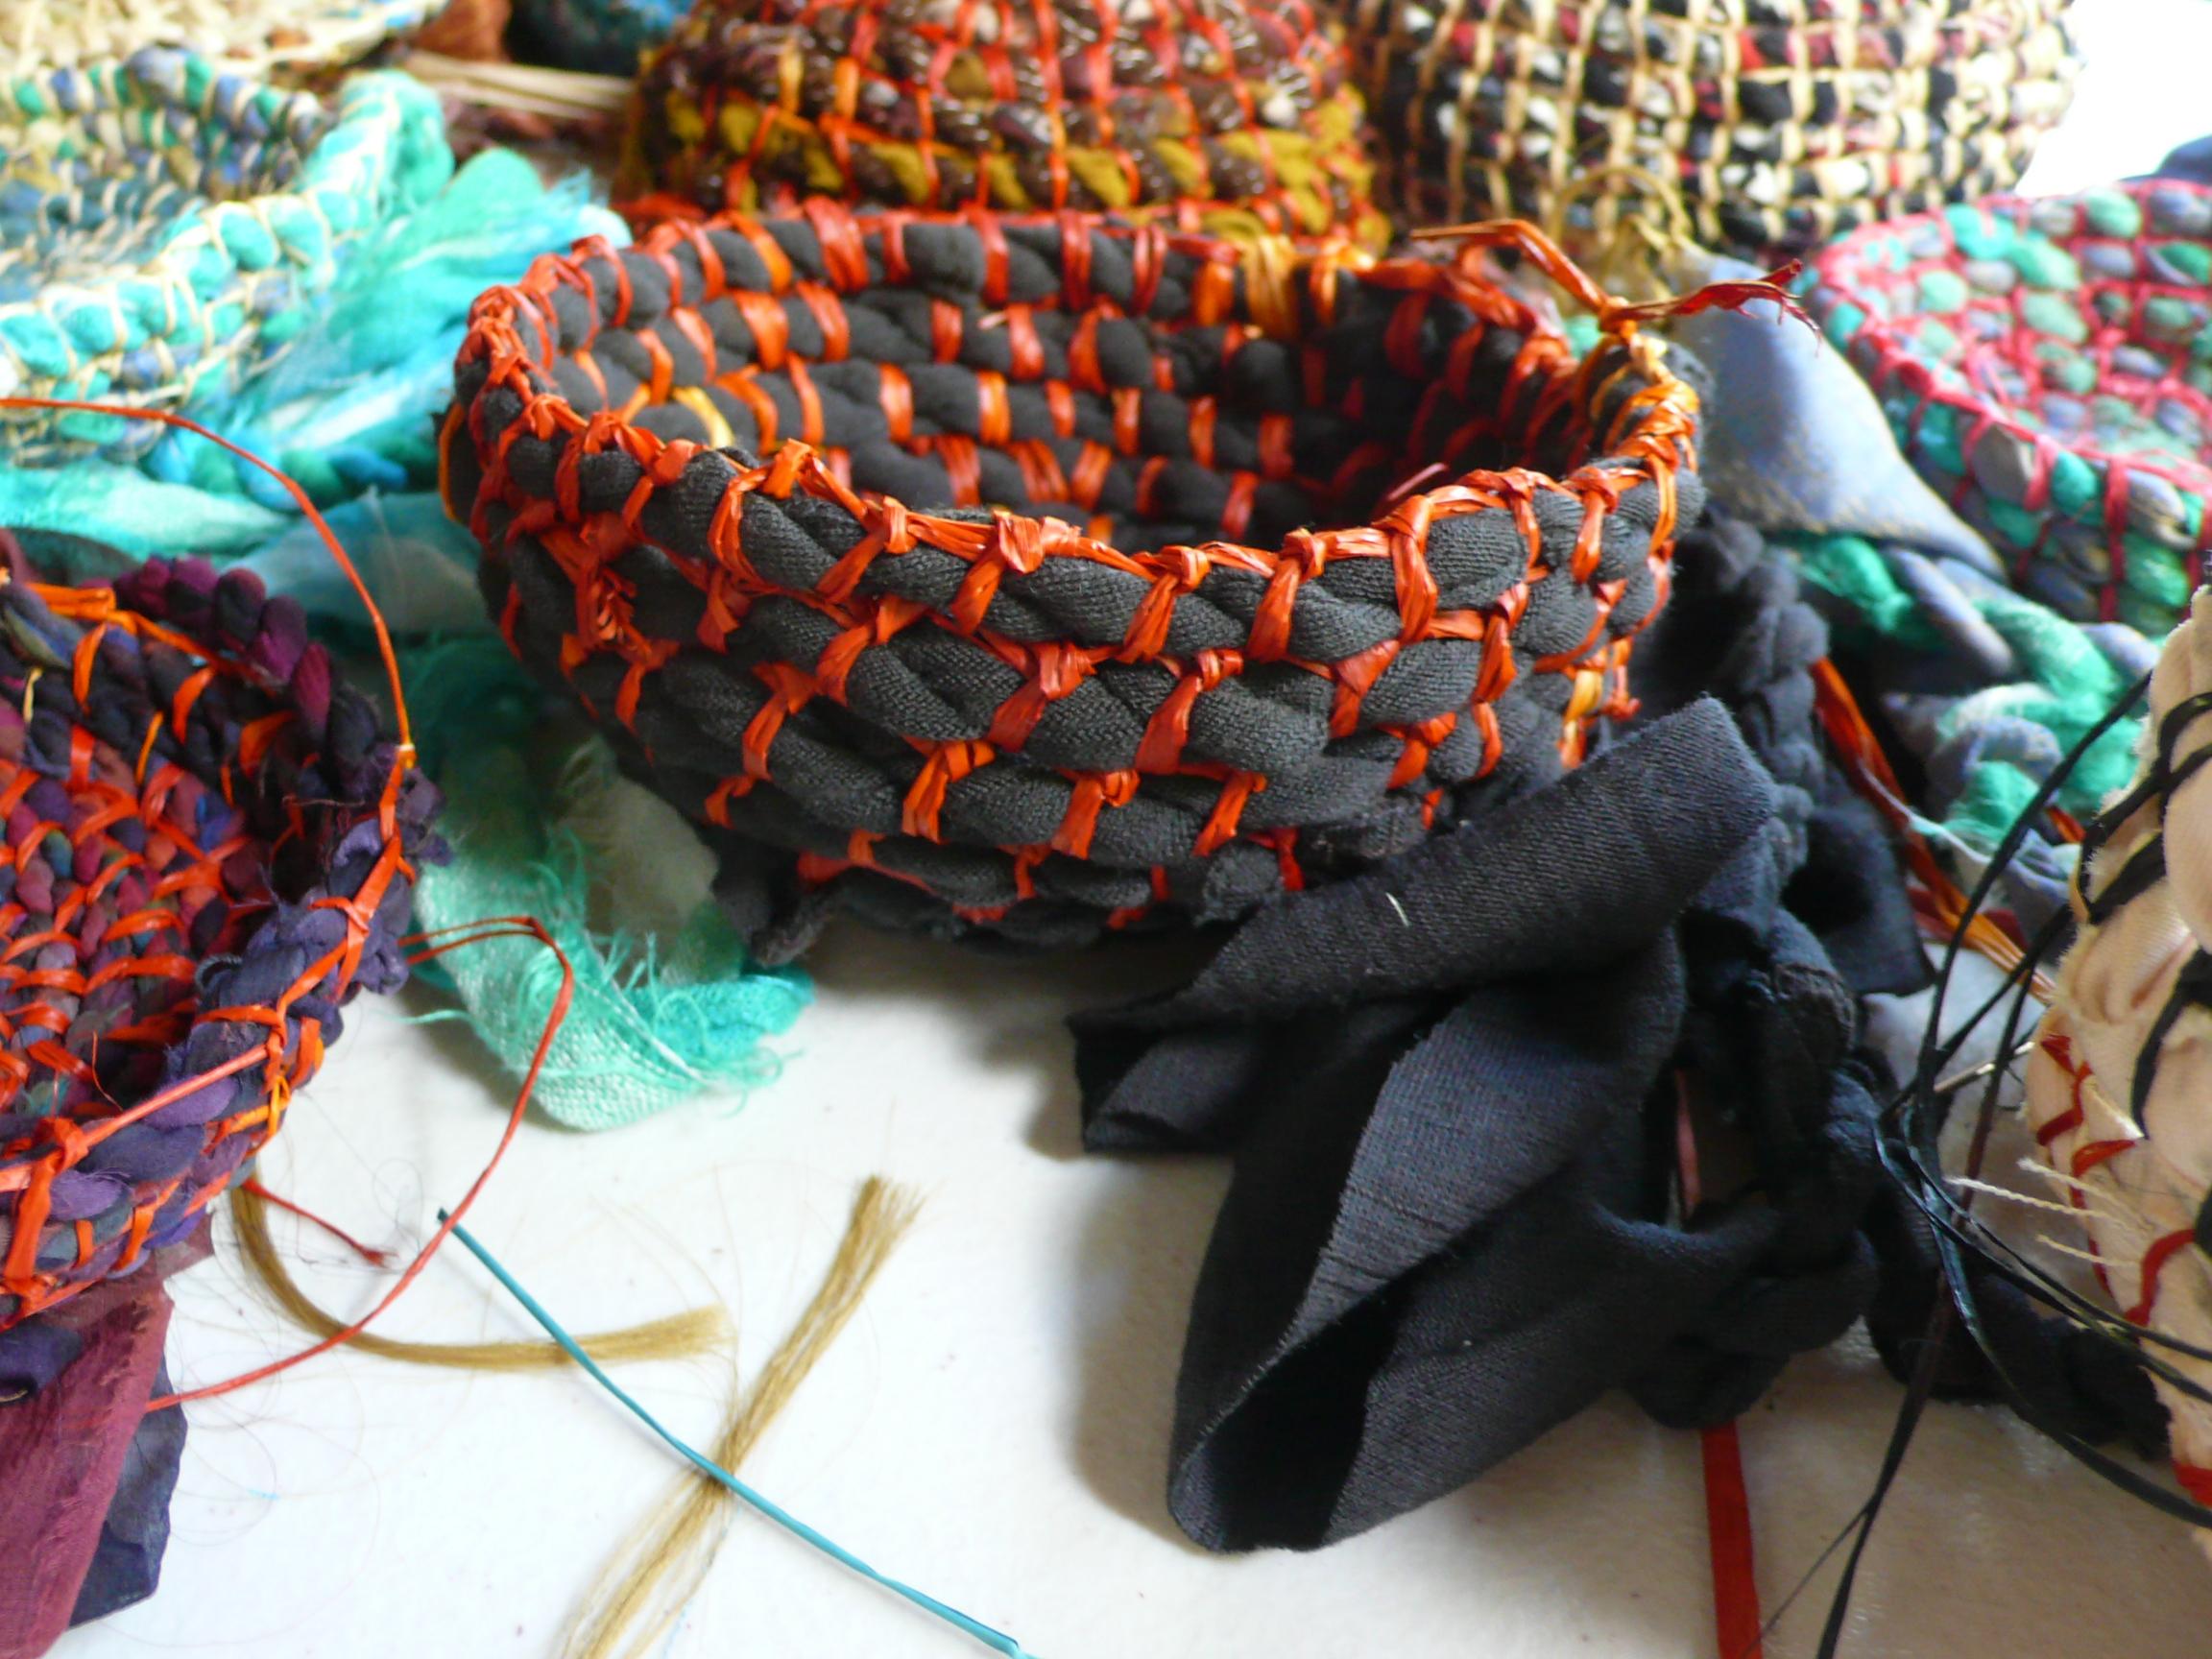 Baskets detail